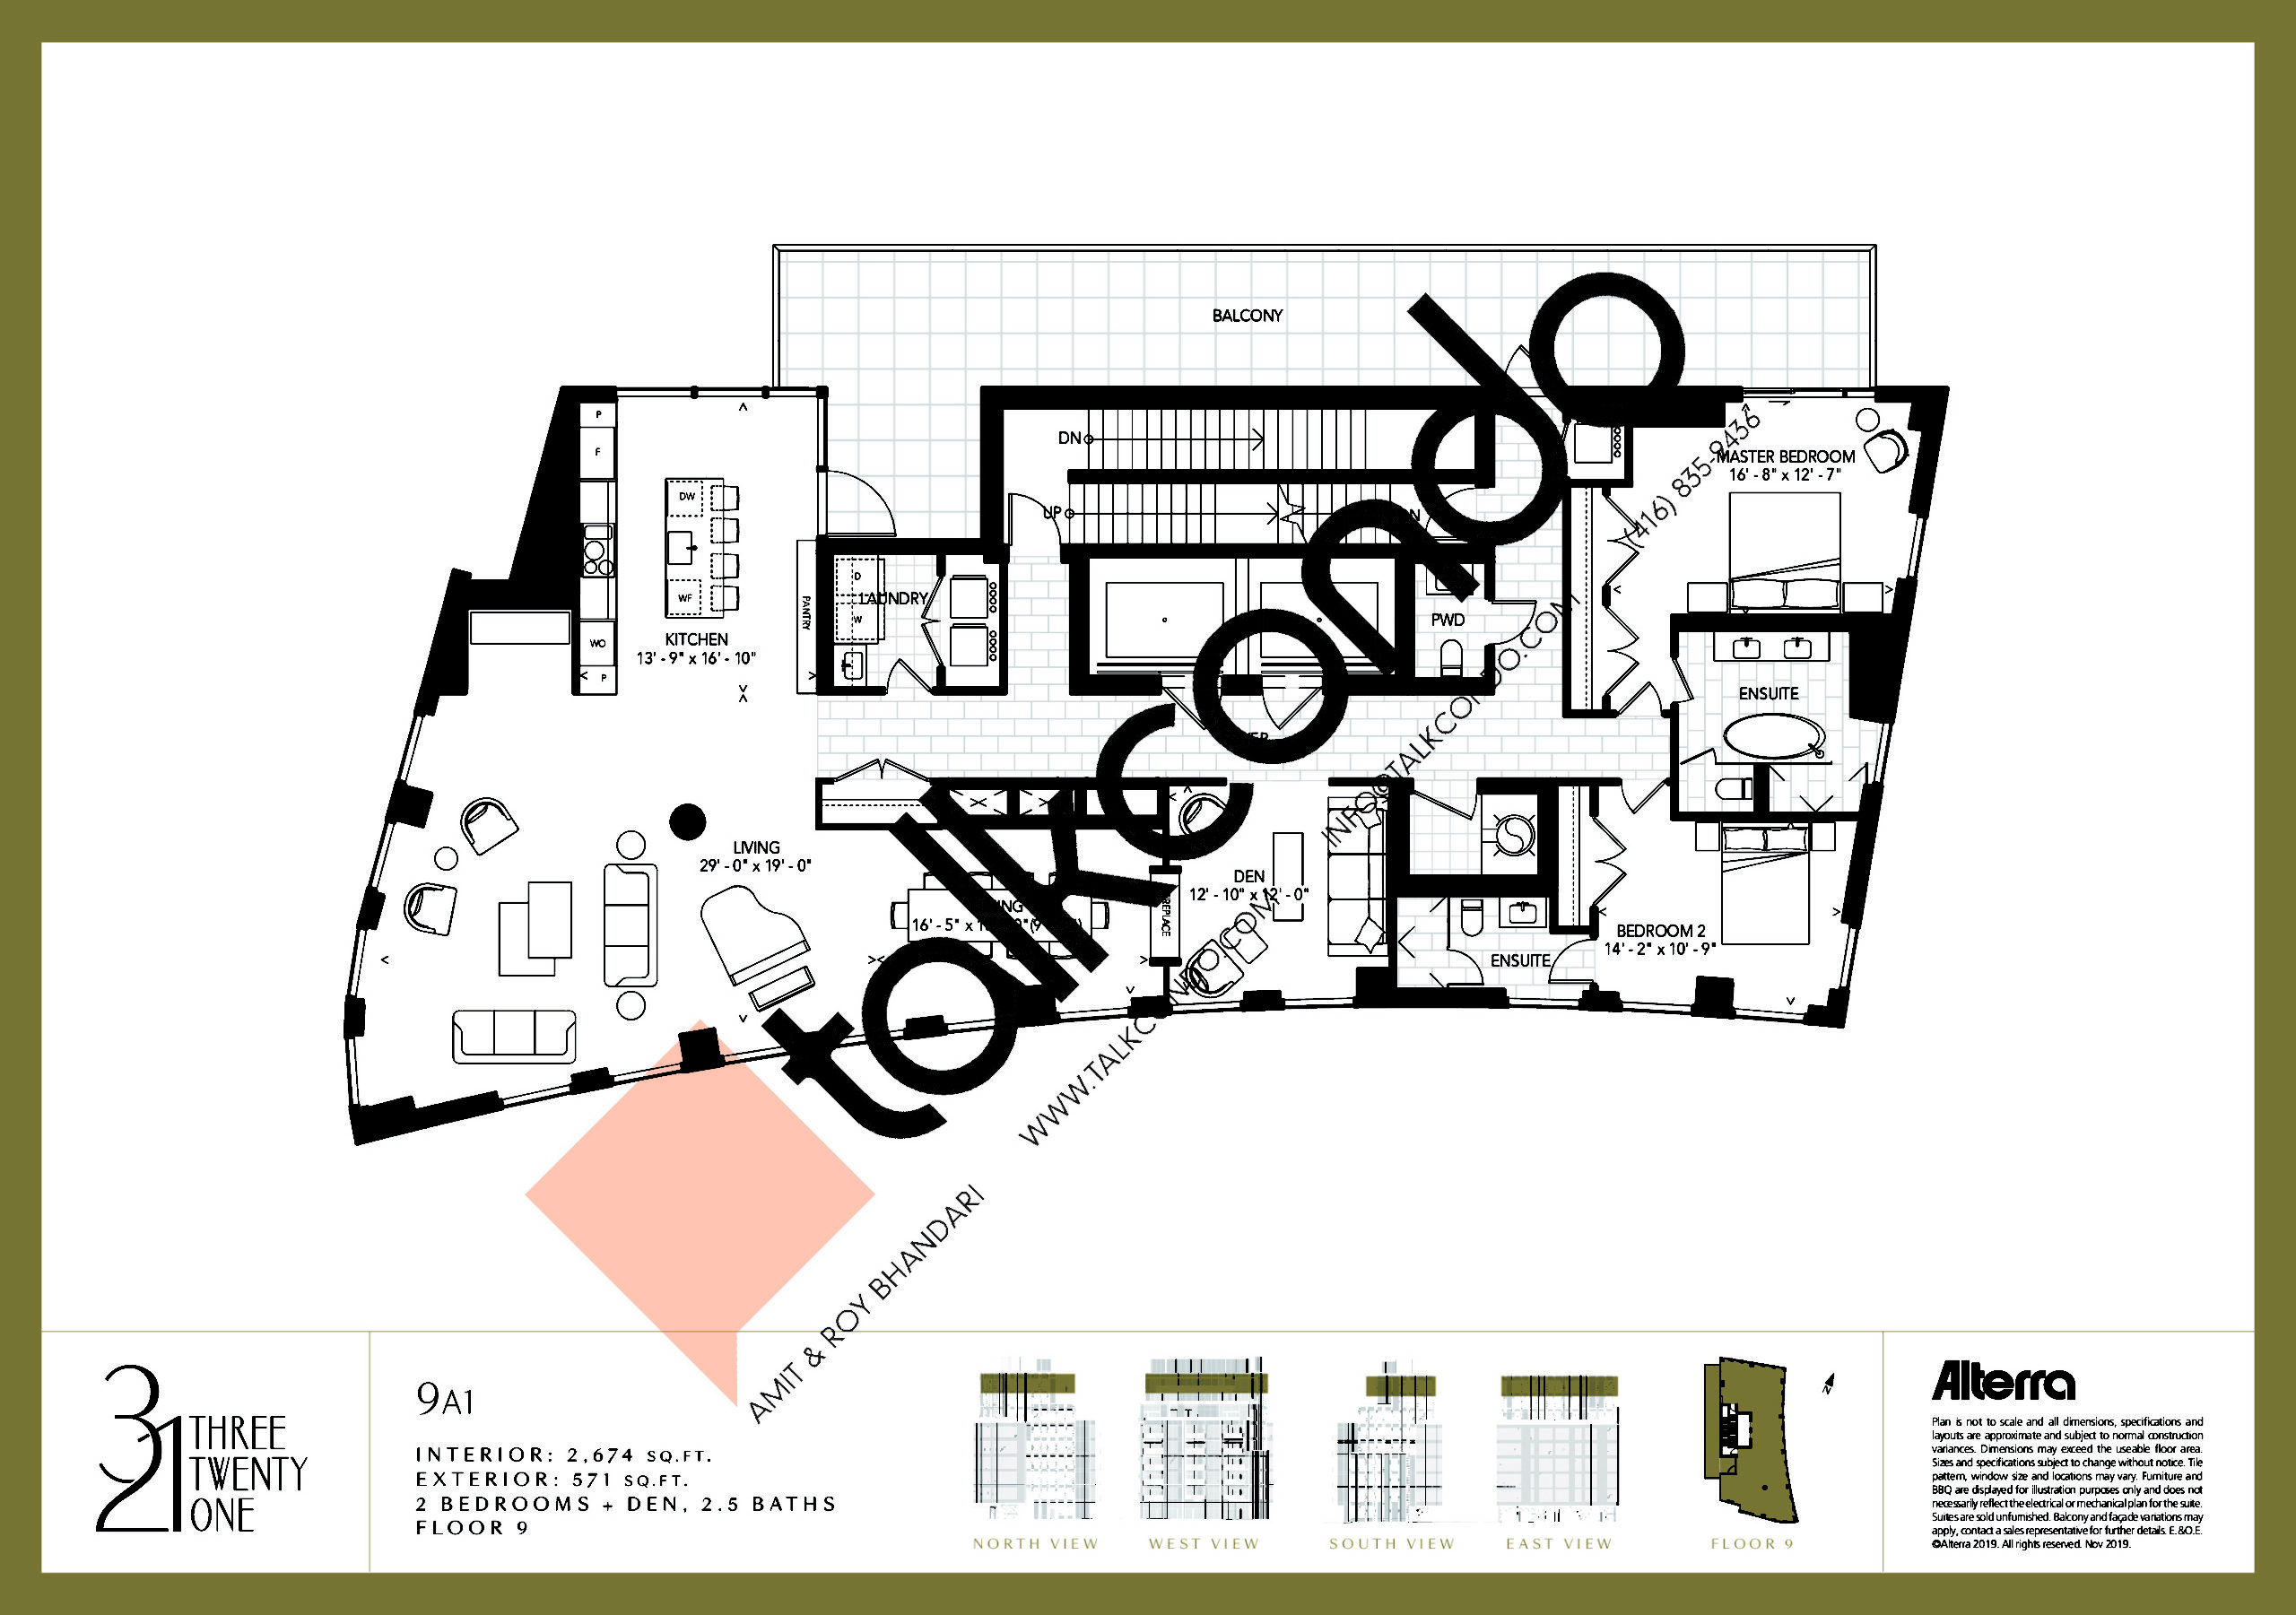 9A1 Floor Plan at 321 Davenport Condos - 2674 sq.ft